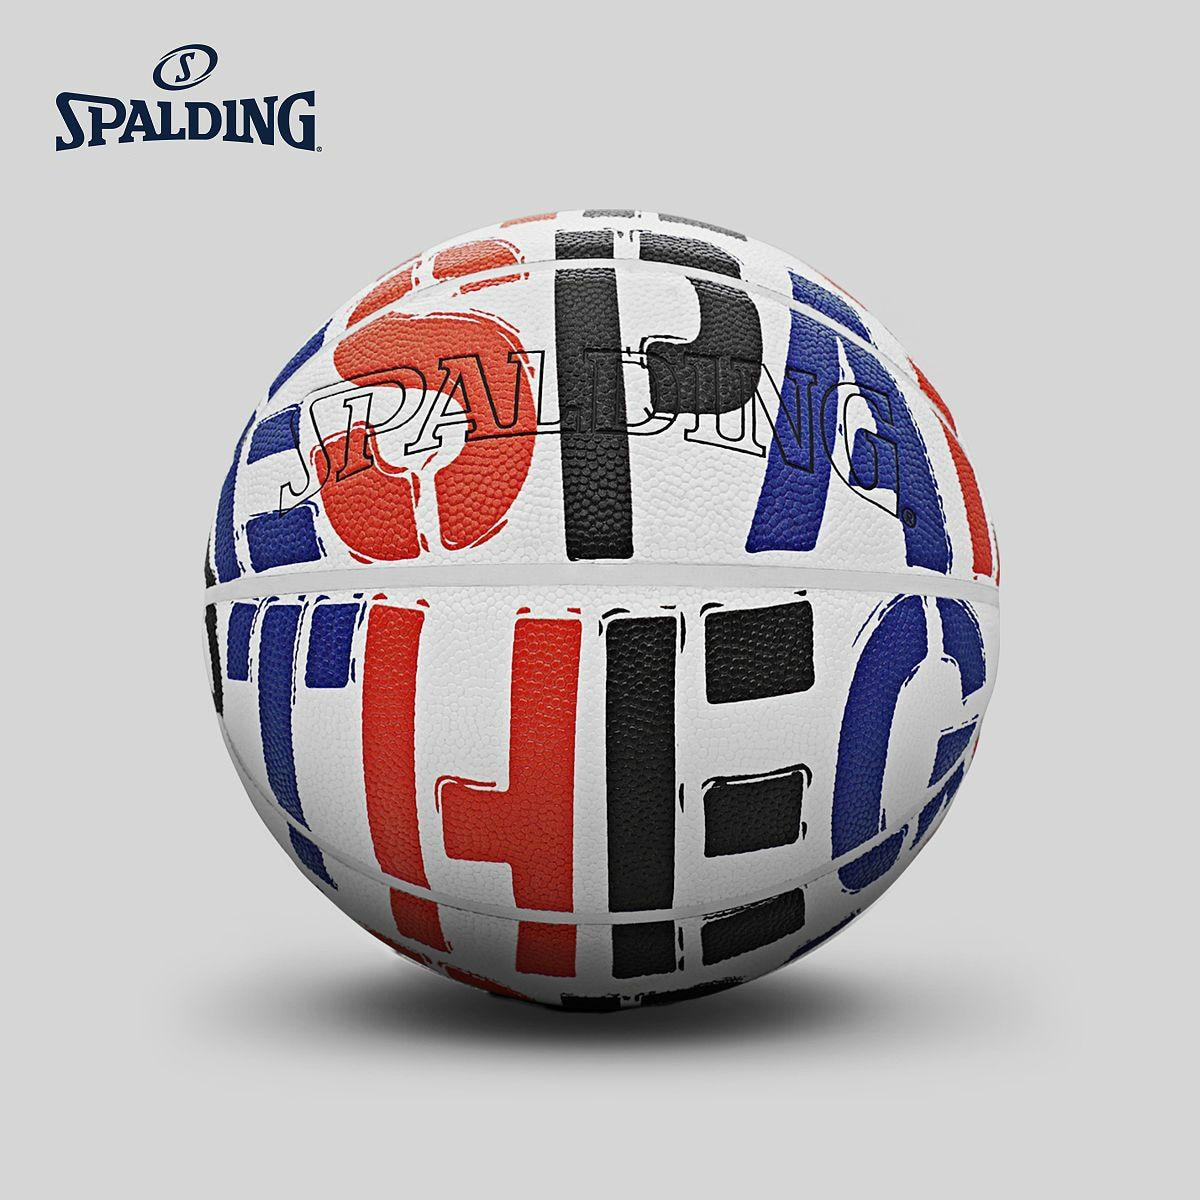 Spalding's New Pu Standard Basketball No. 7 Basketball Baloncesto Basketball Color Graffiti Trend Basketball